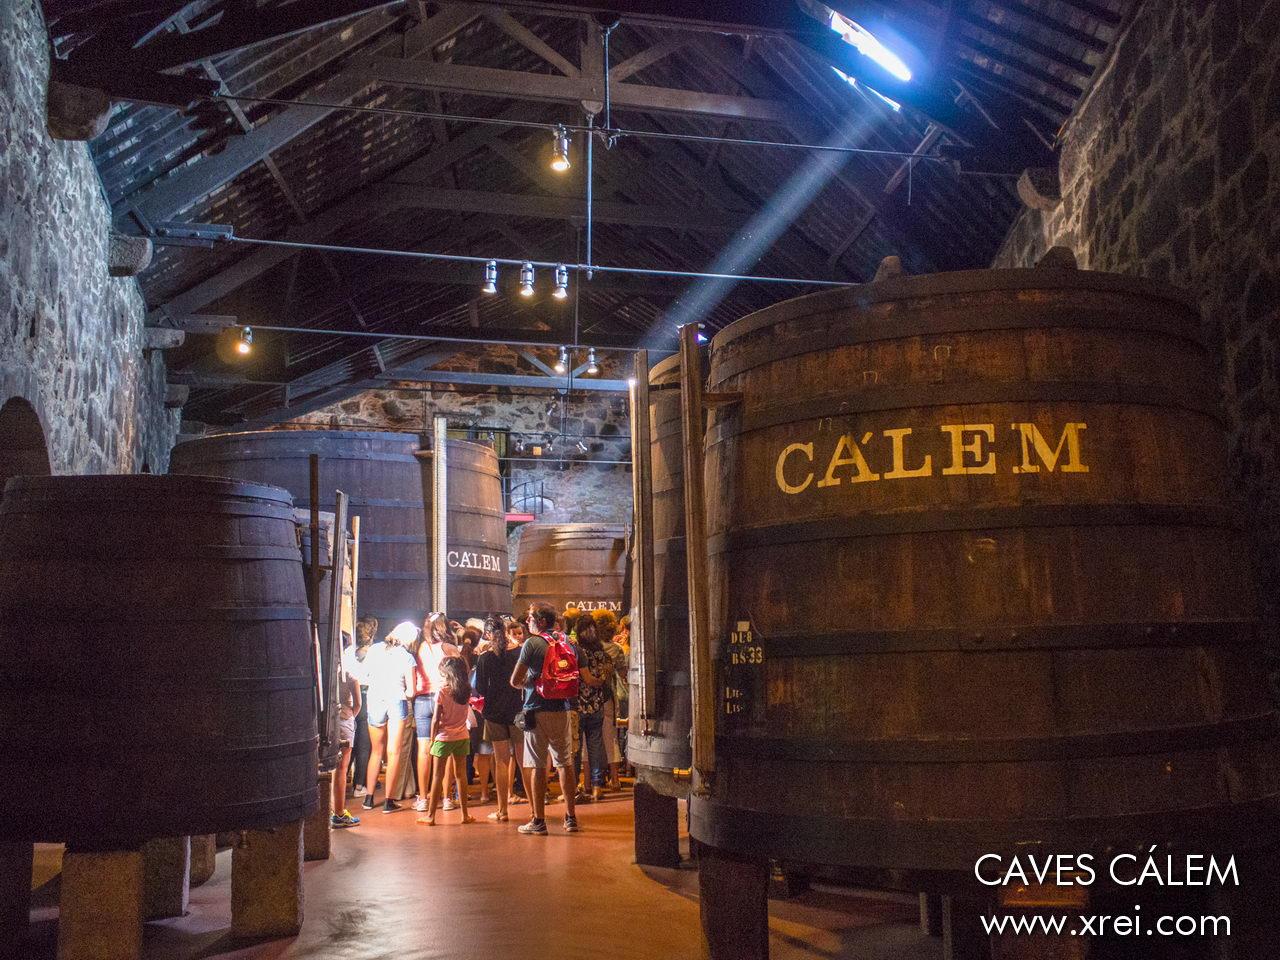 Visita a las bodegas de vino de Oporto CEMAL, con silos de vino tradicionales construidos en madera natural.